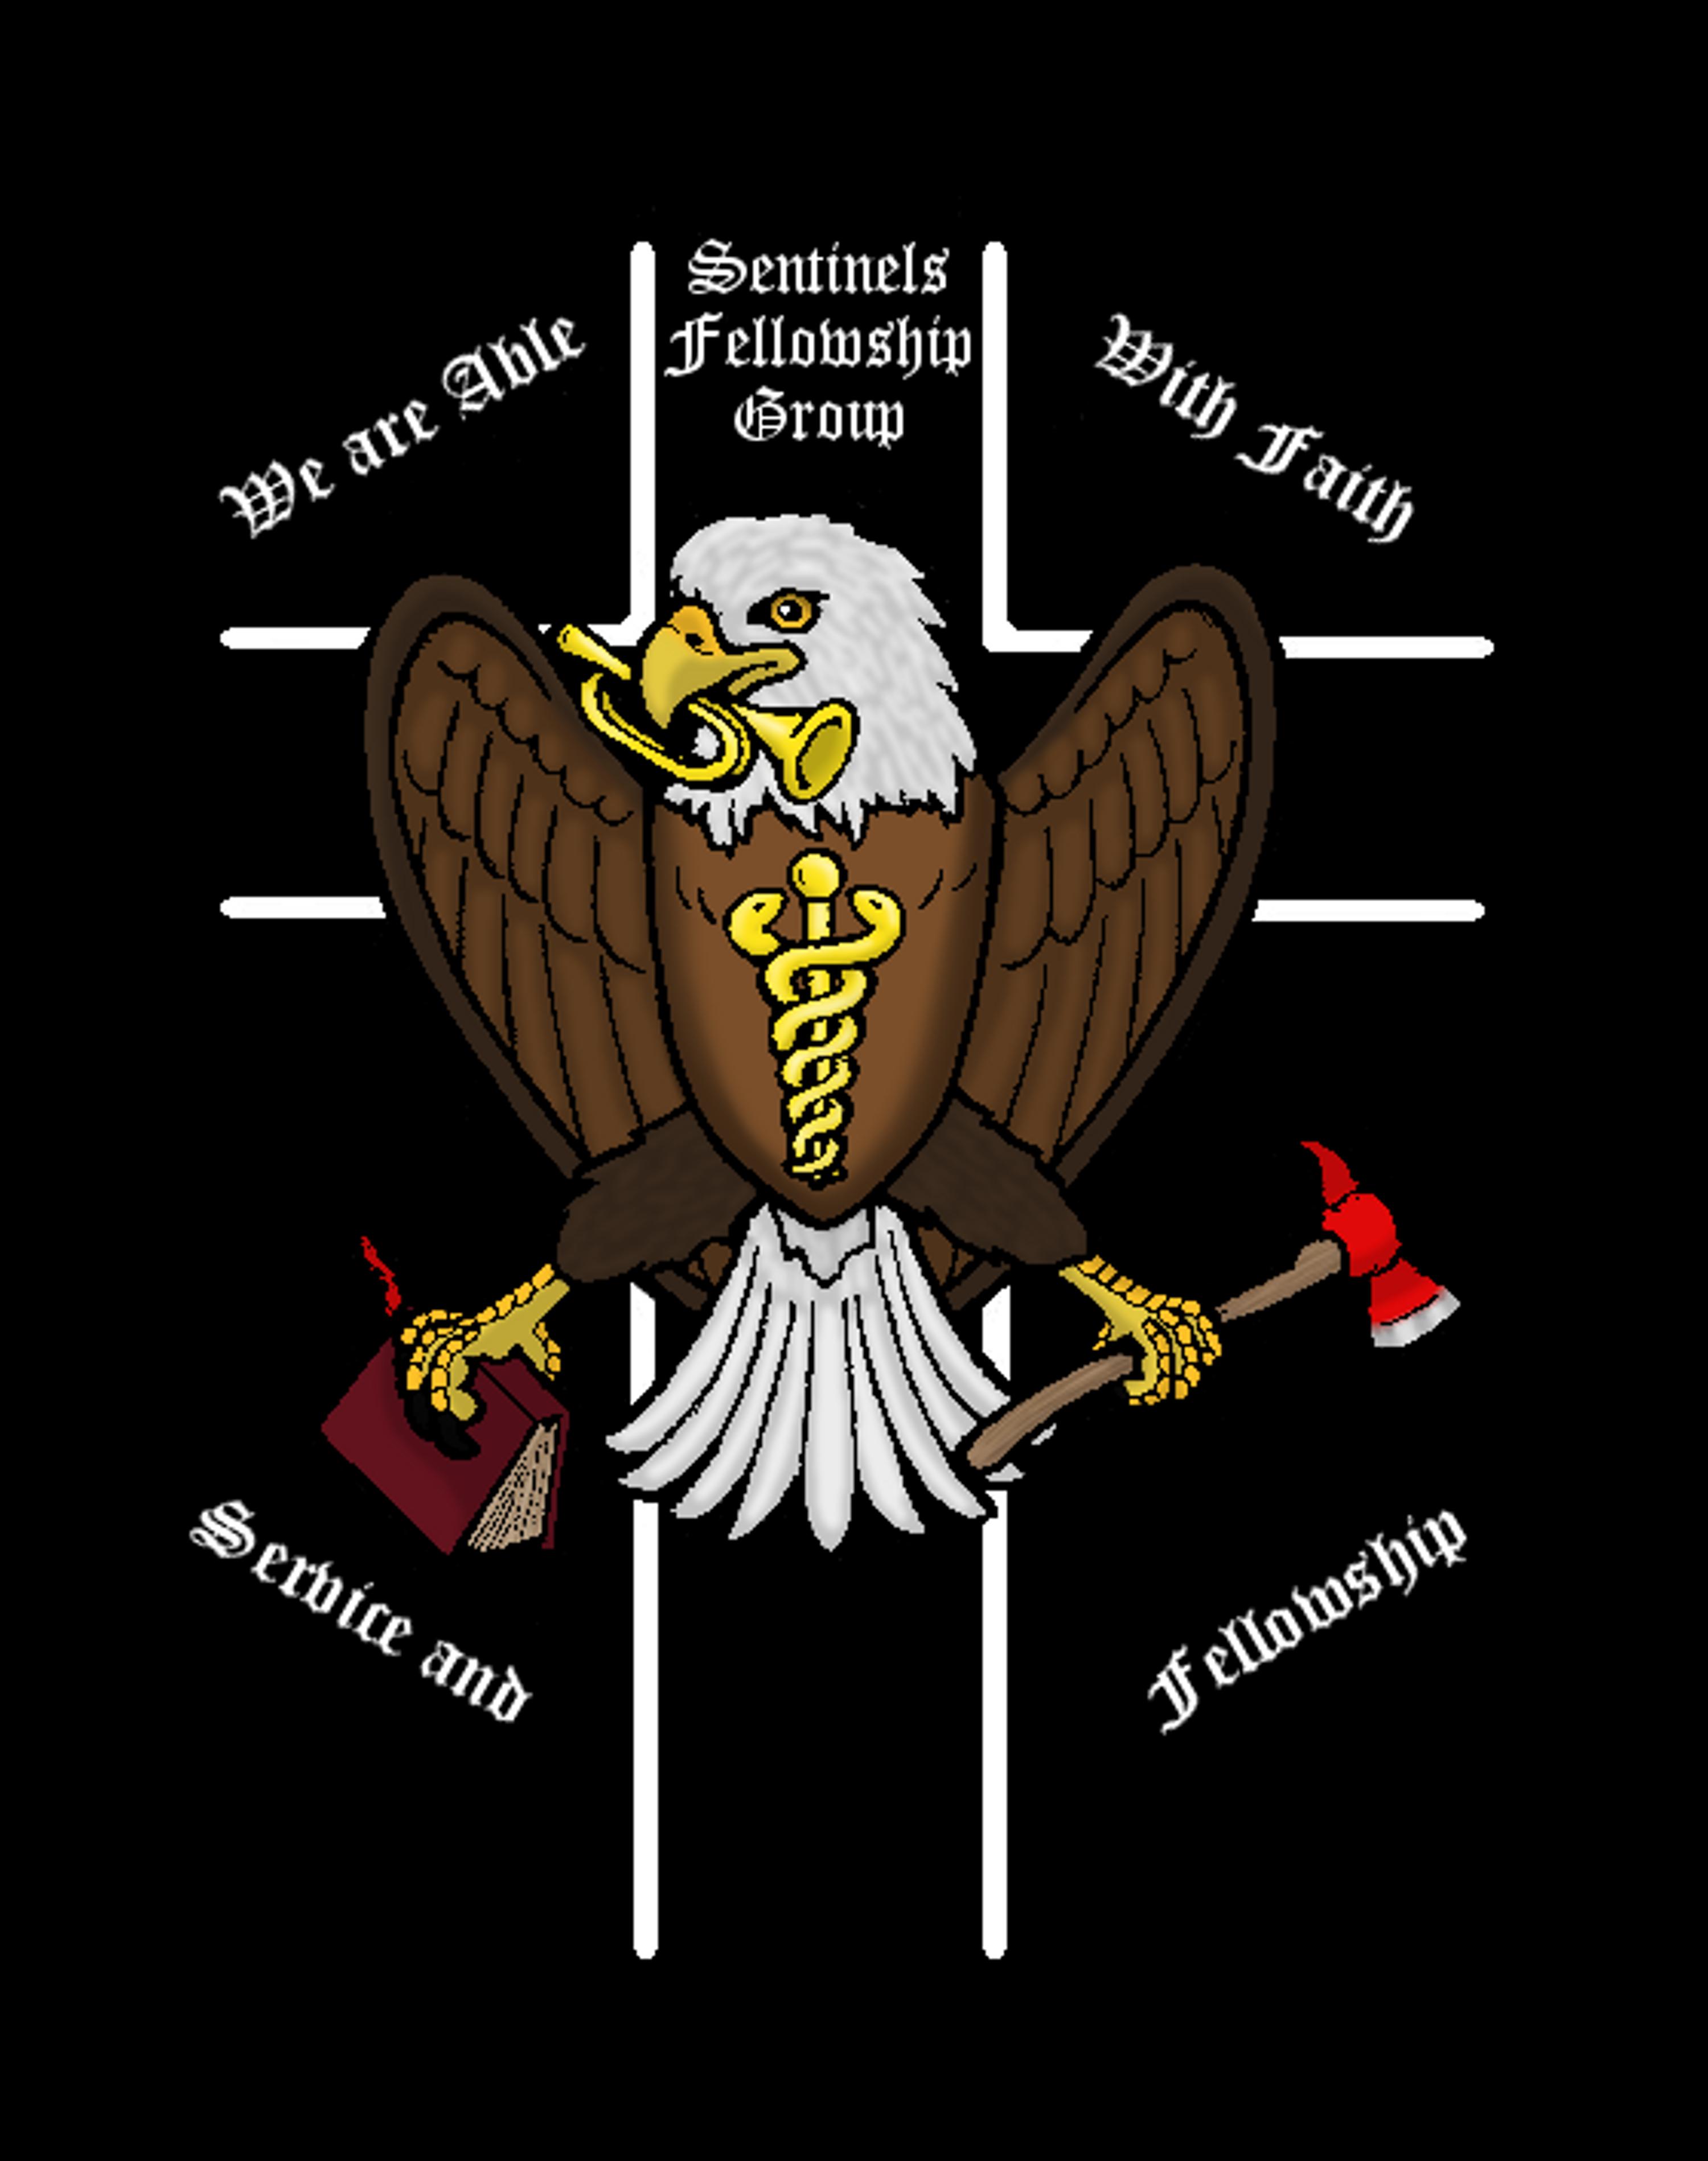 Carolina Sentinels